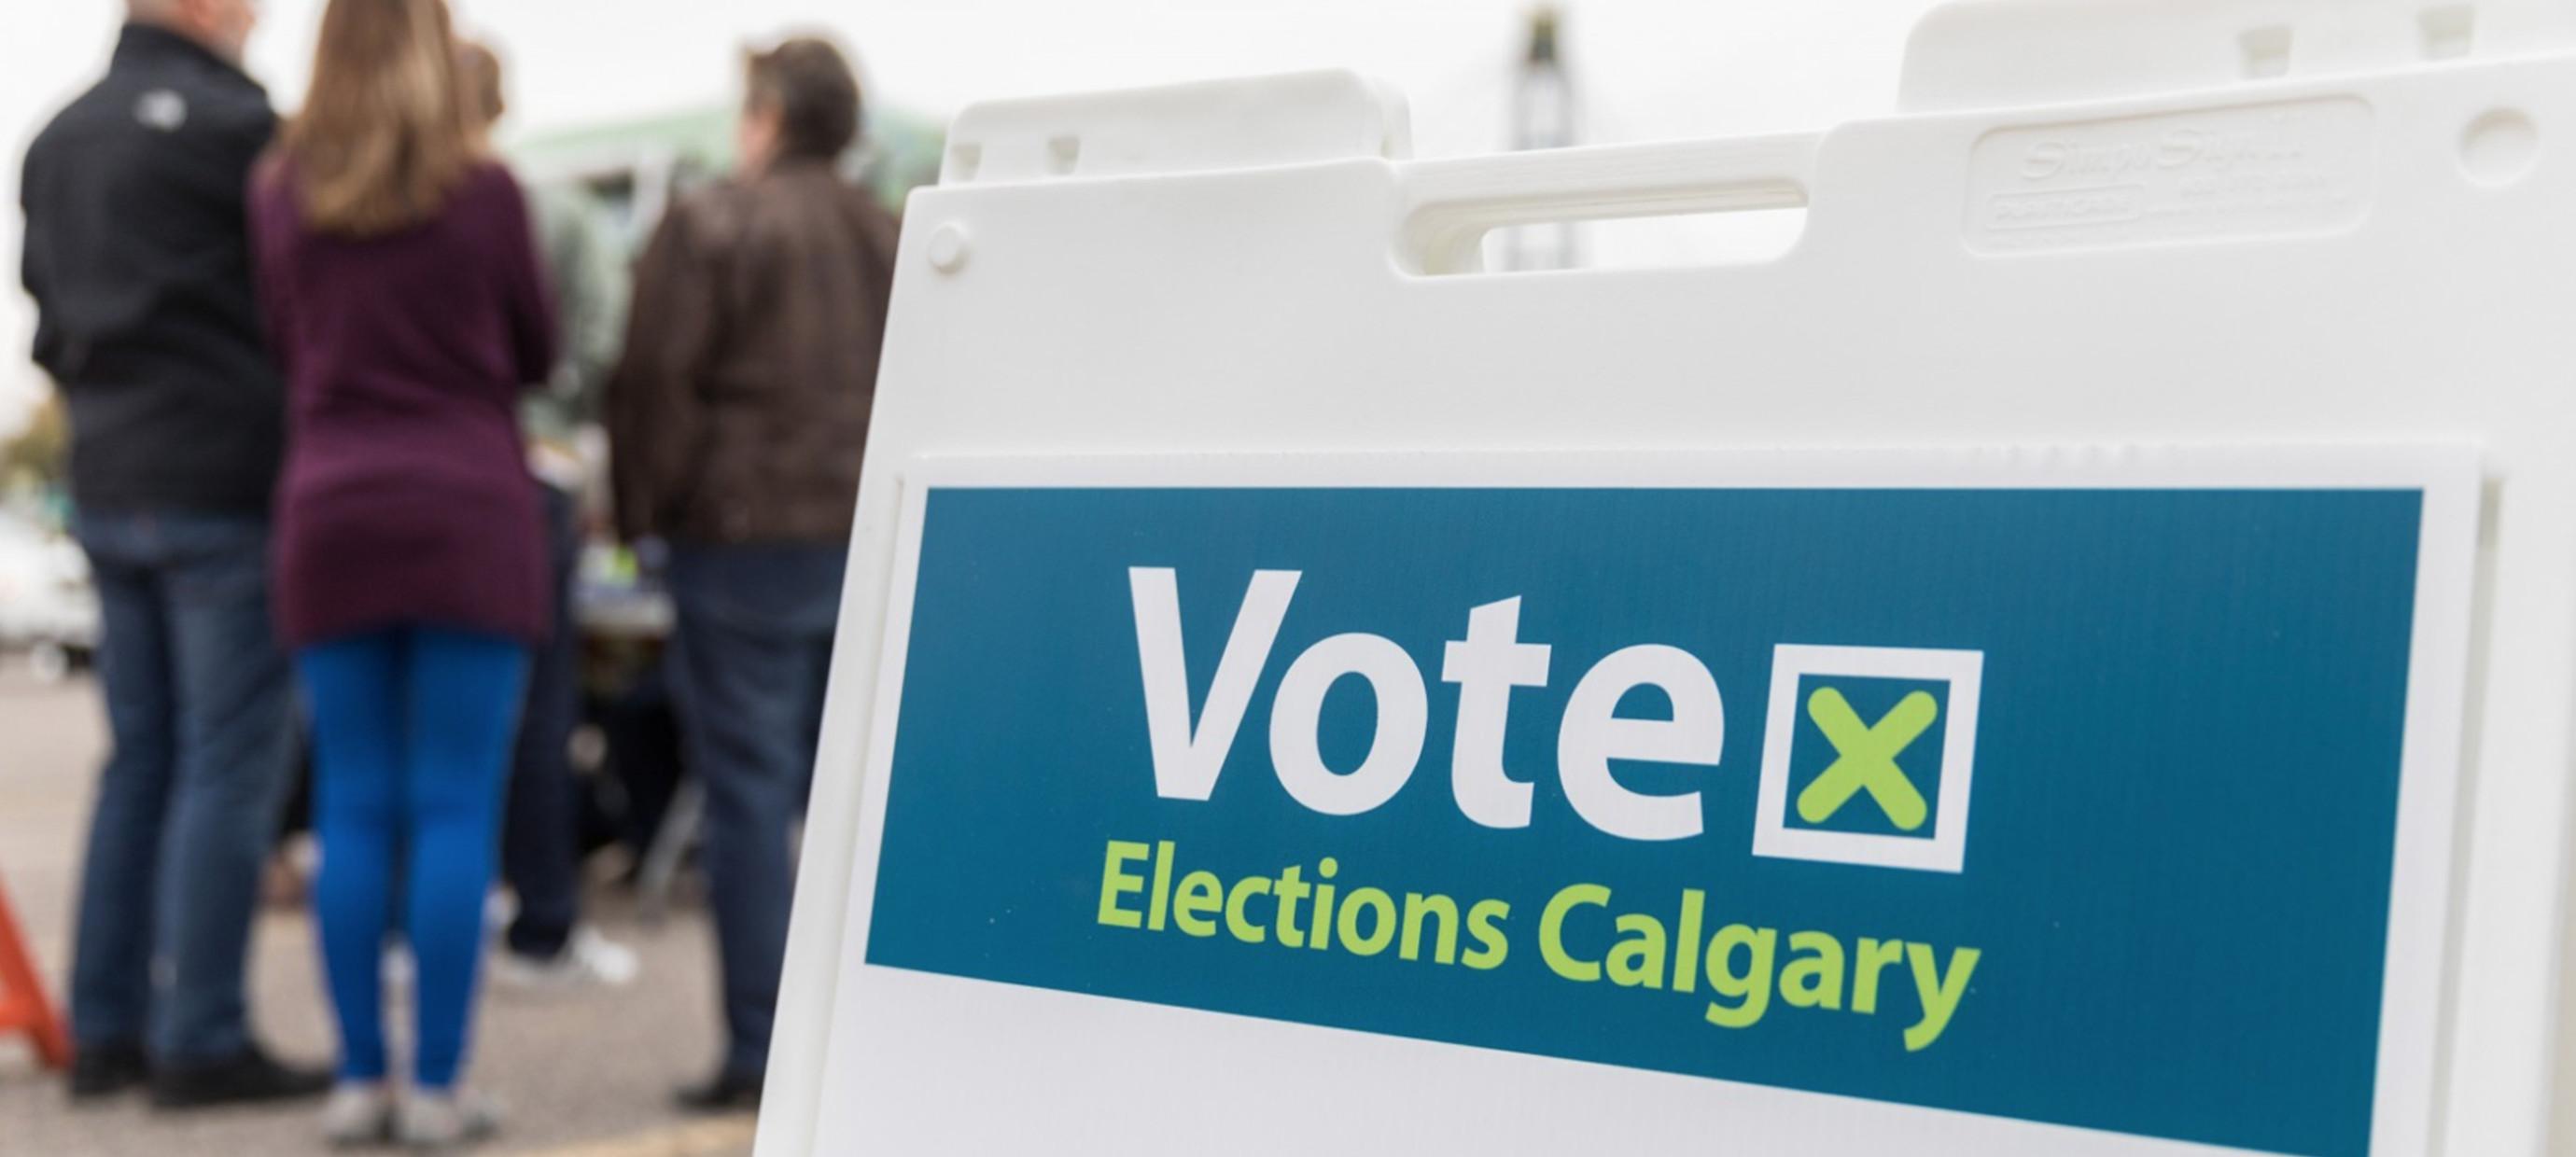 Civic Election Engagement 101